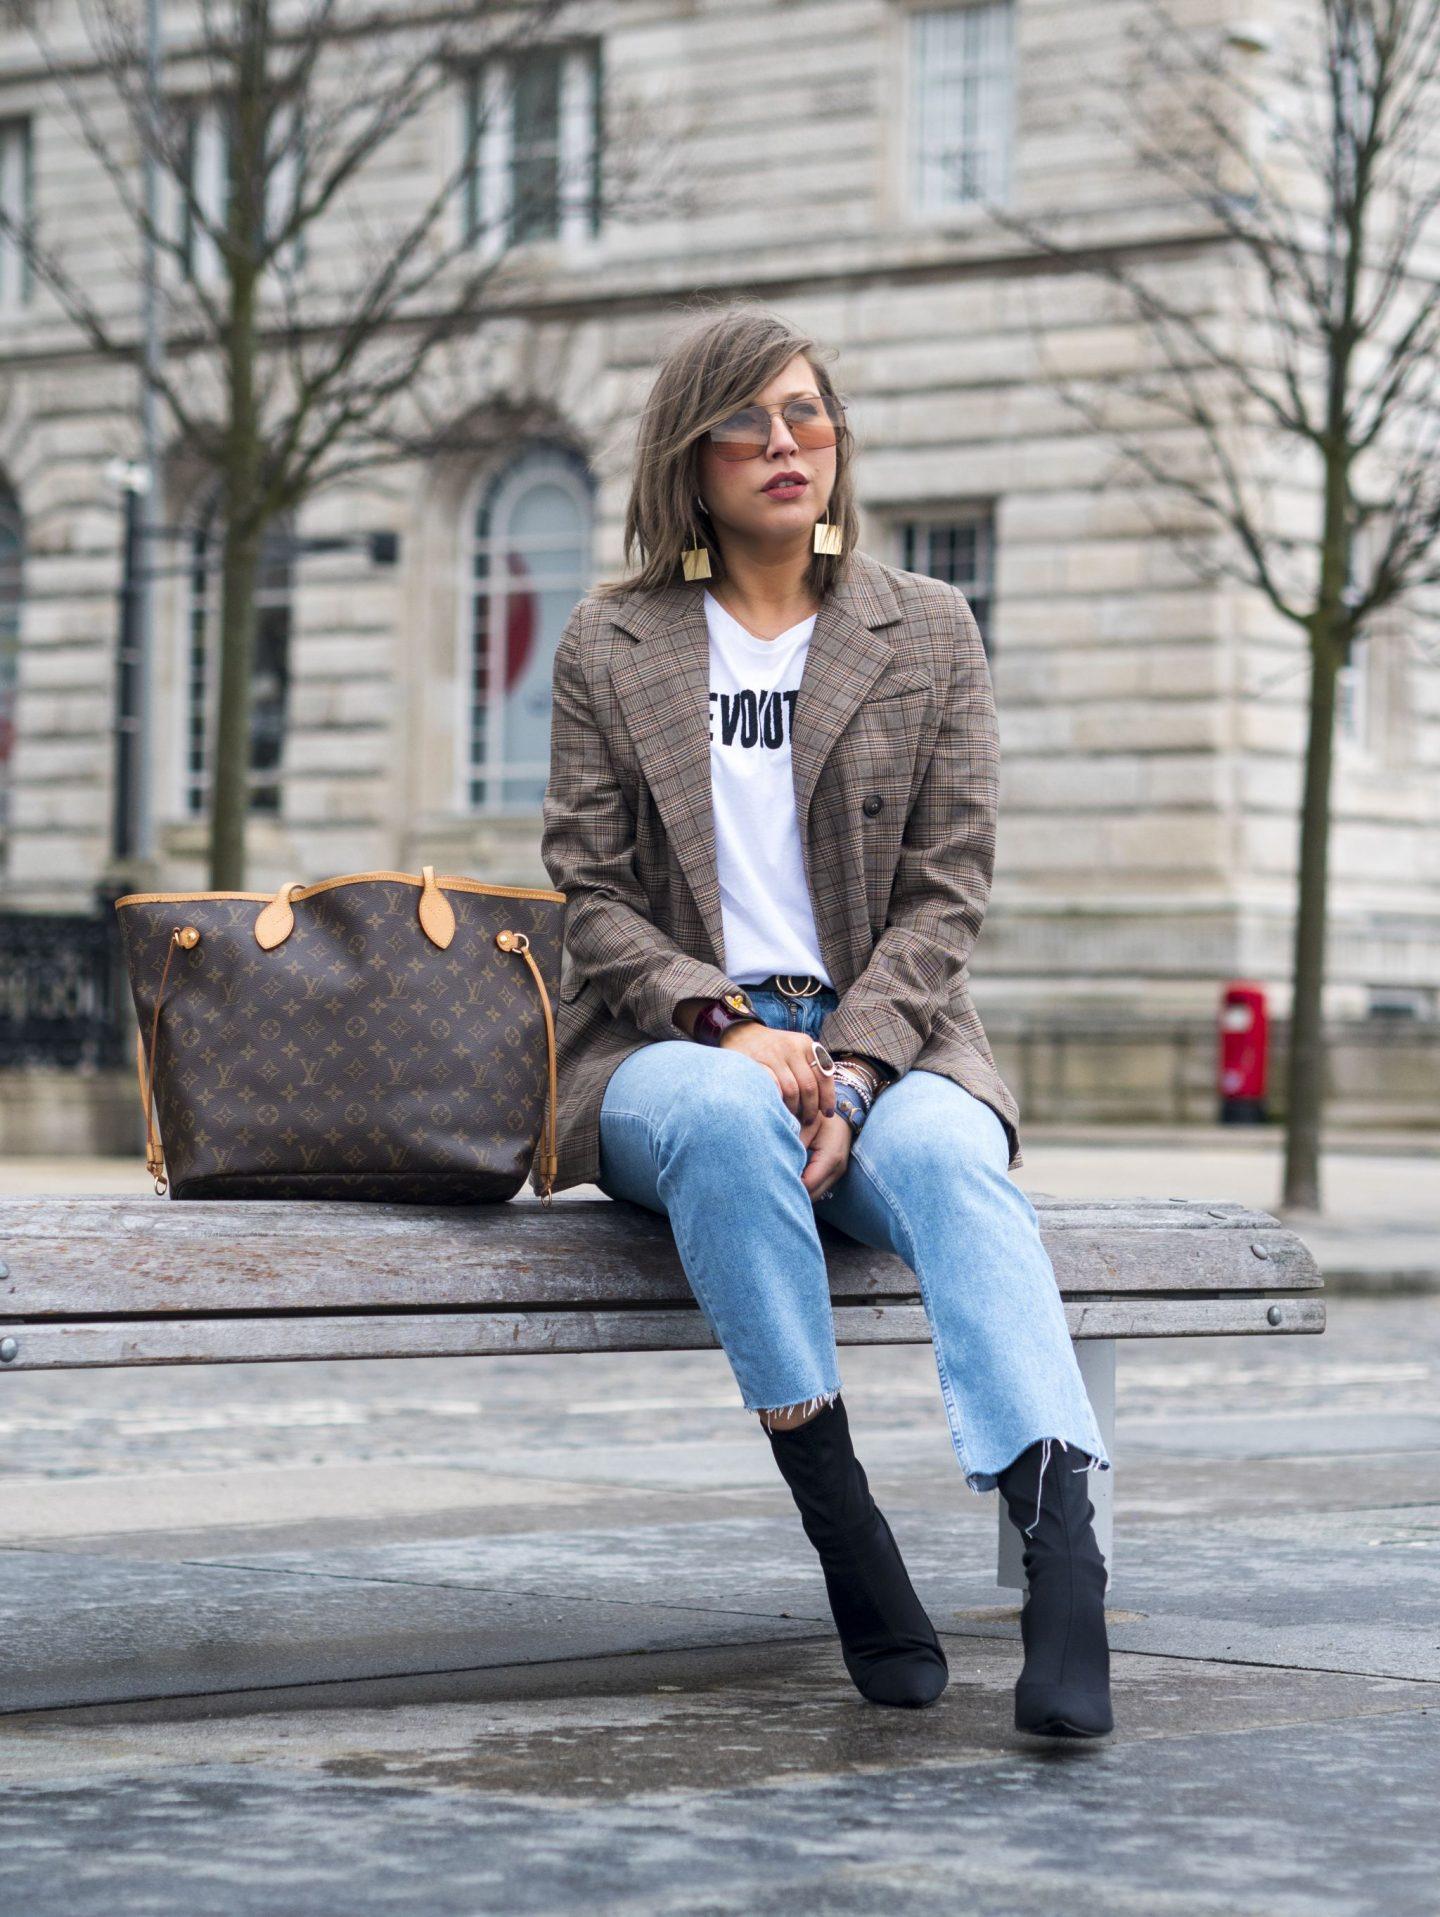 manchester fashion blogger , revolution t shirt, mango , manchester fashion revolution, check blazer, Louis Vuitton, topshop straight jeans , manchester